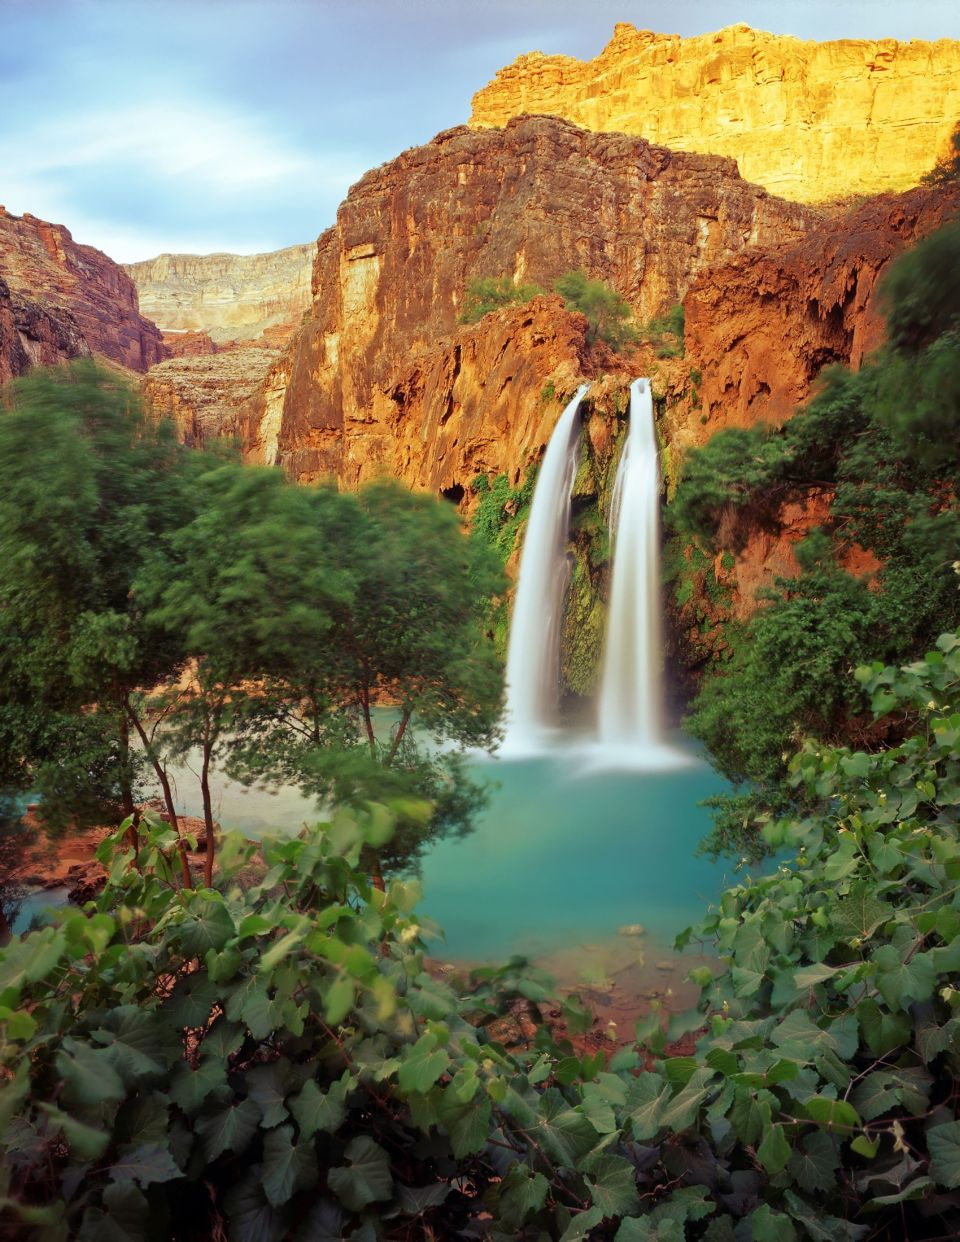 The world 39 s most incredible natural pools easyvoyage for Natural pools arizona